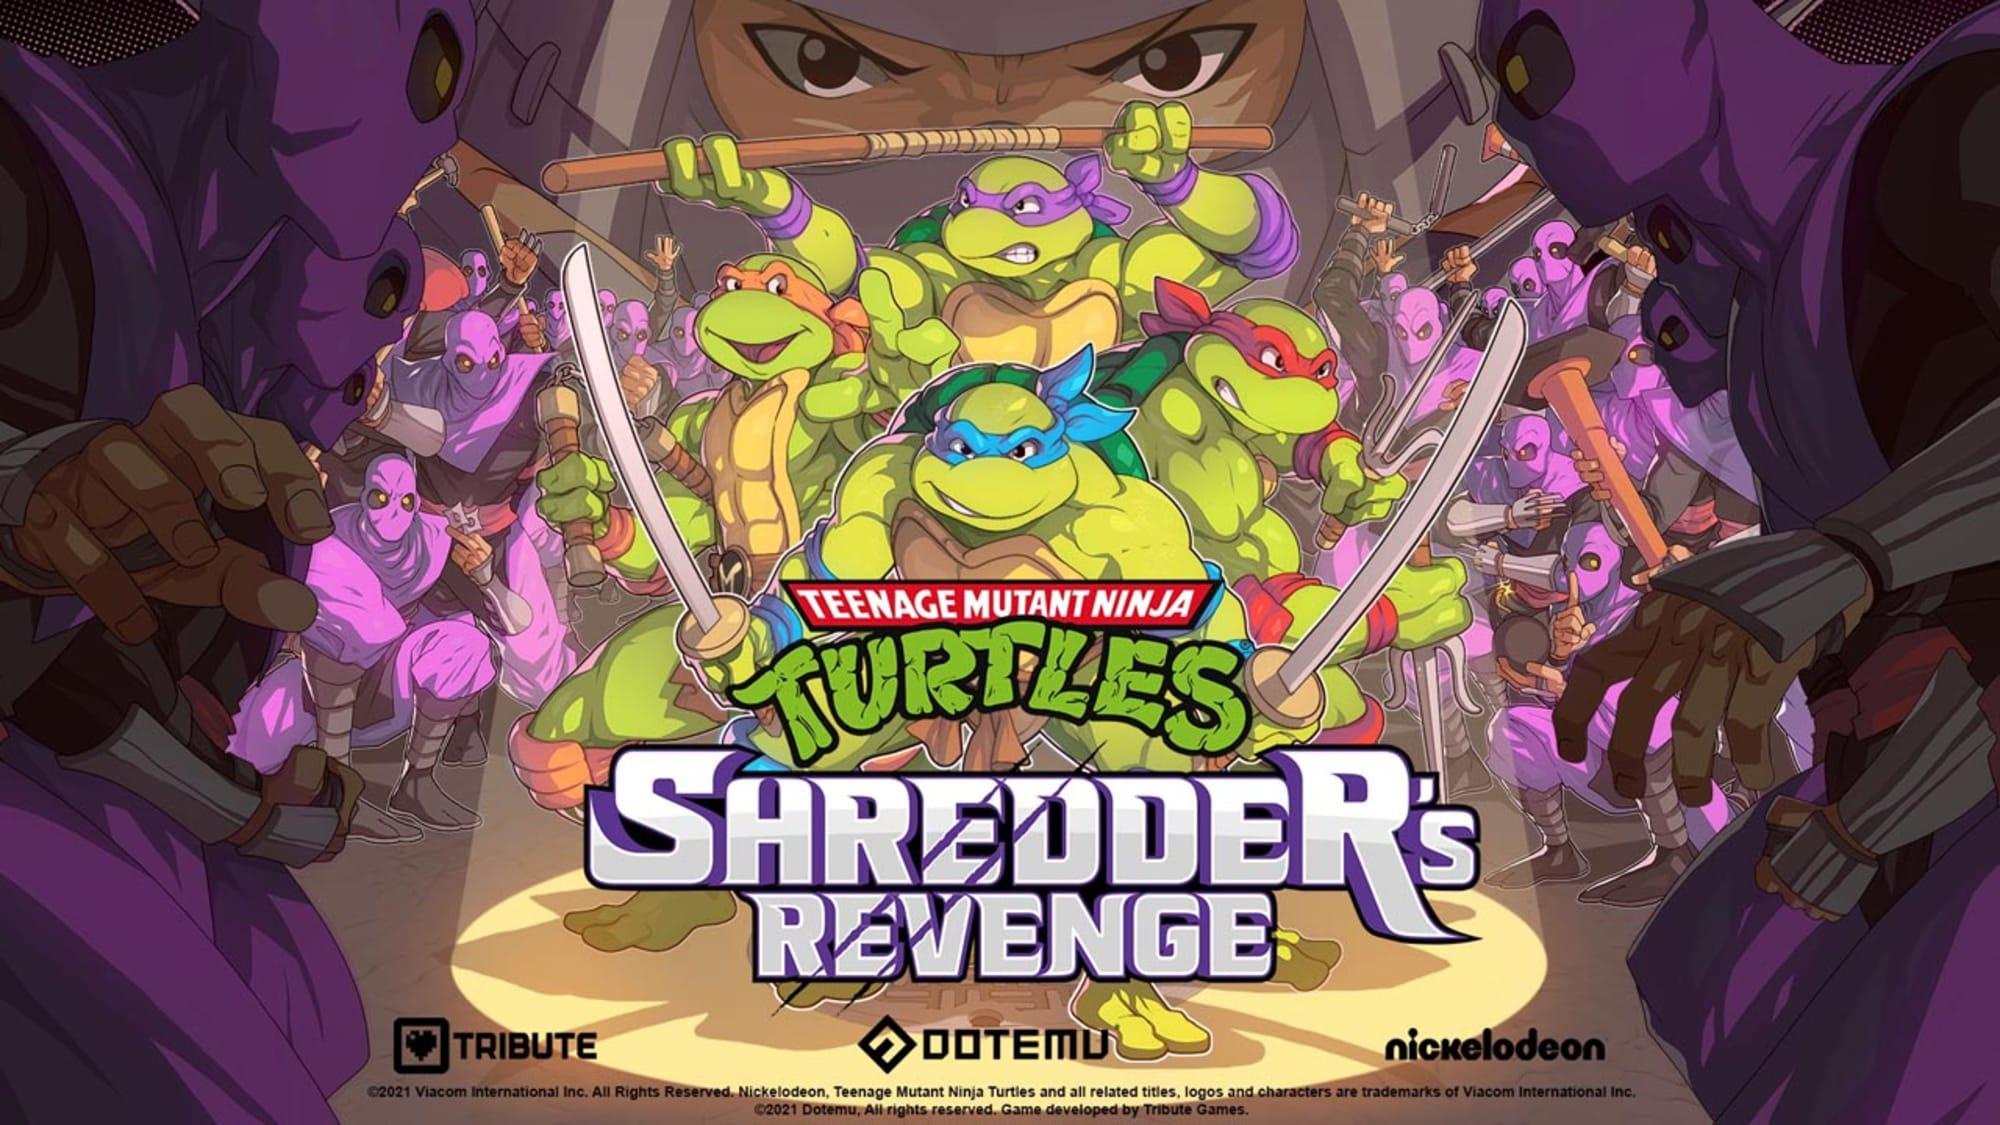 Teenage Mutant Ninja Turtles: Shredder's Revenge: A potential successor to the franchise's past hits